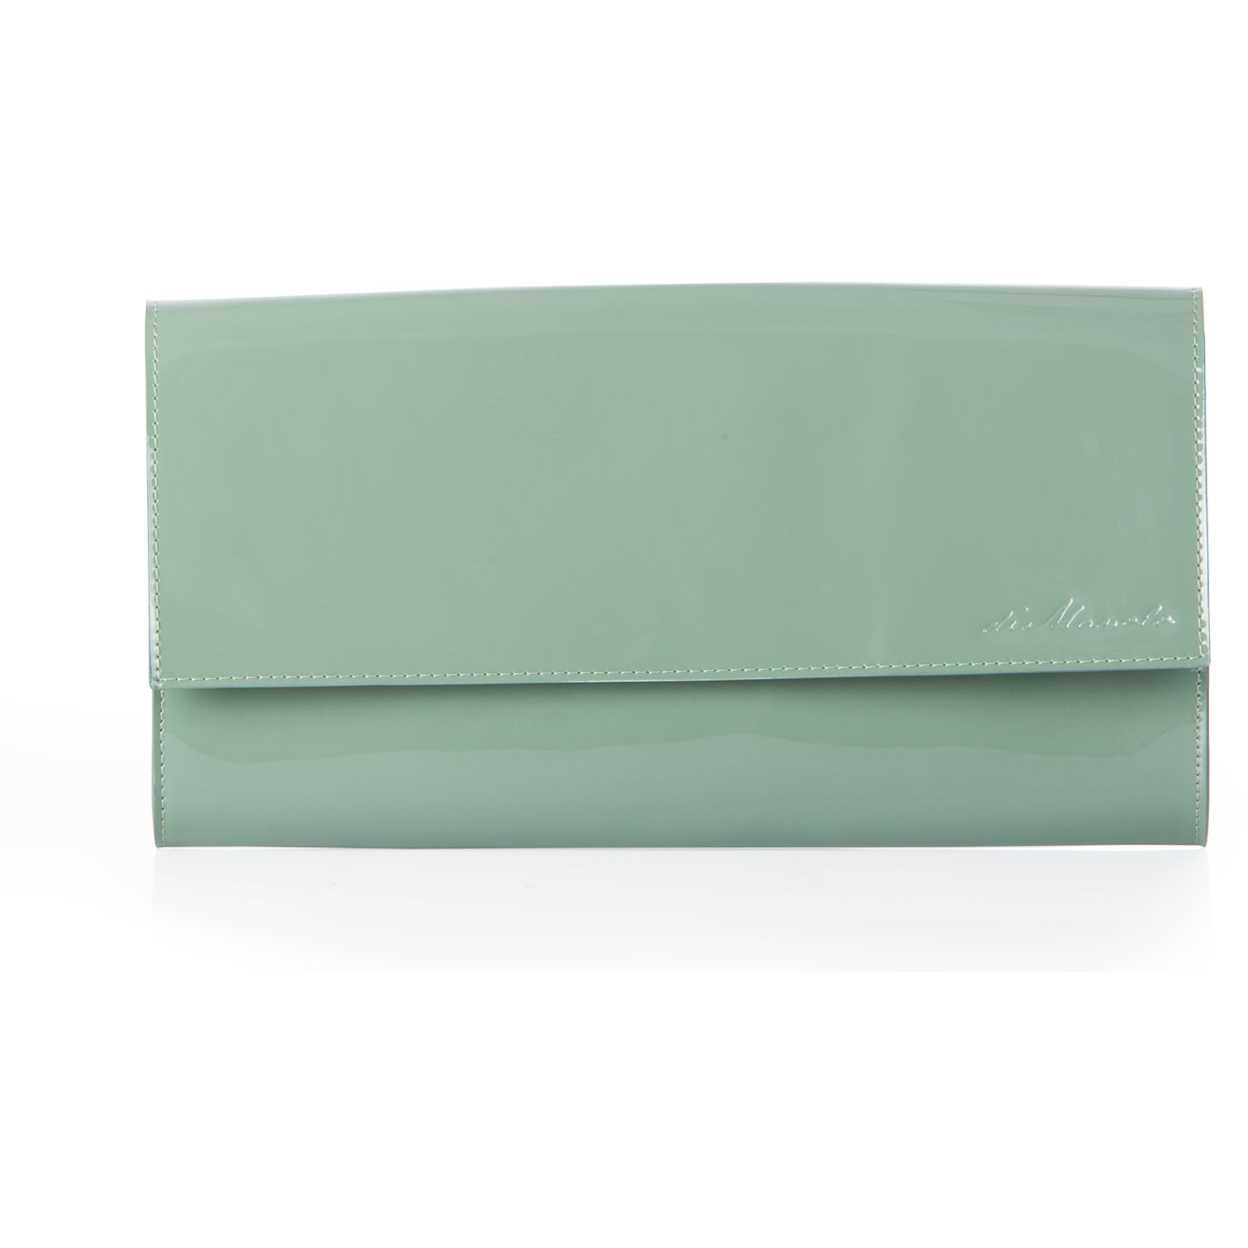 Plic DiManolo verde din piele naturala lacuita SUMMER2014FISTIC